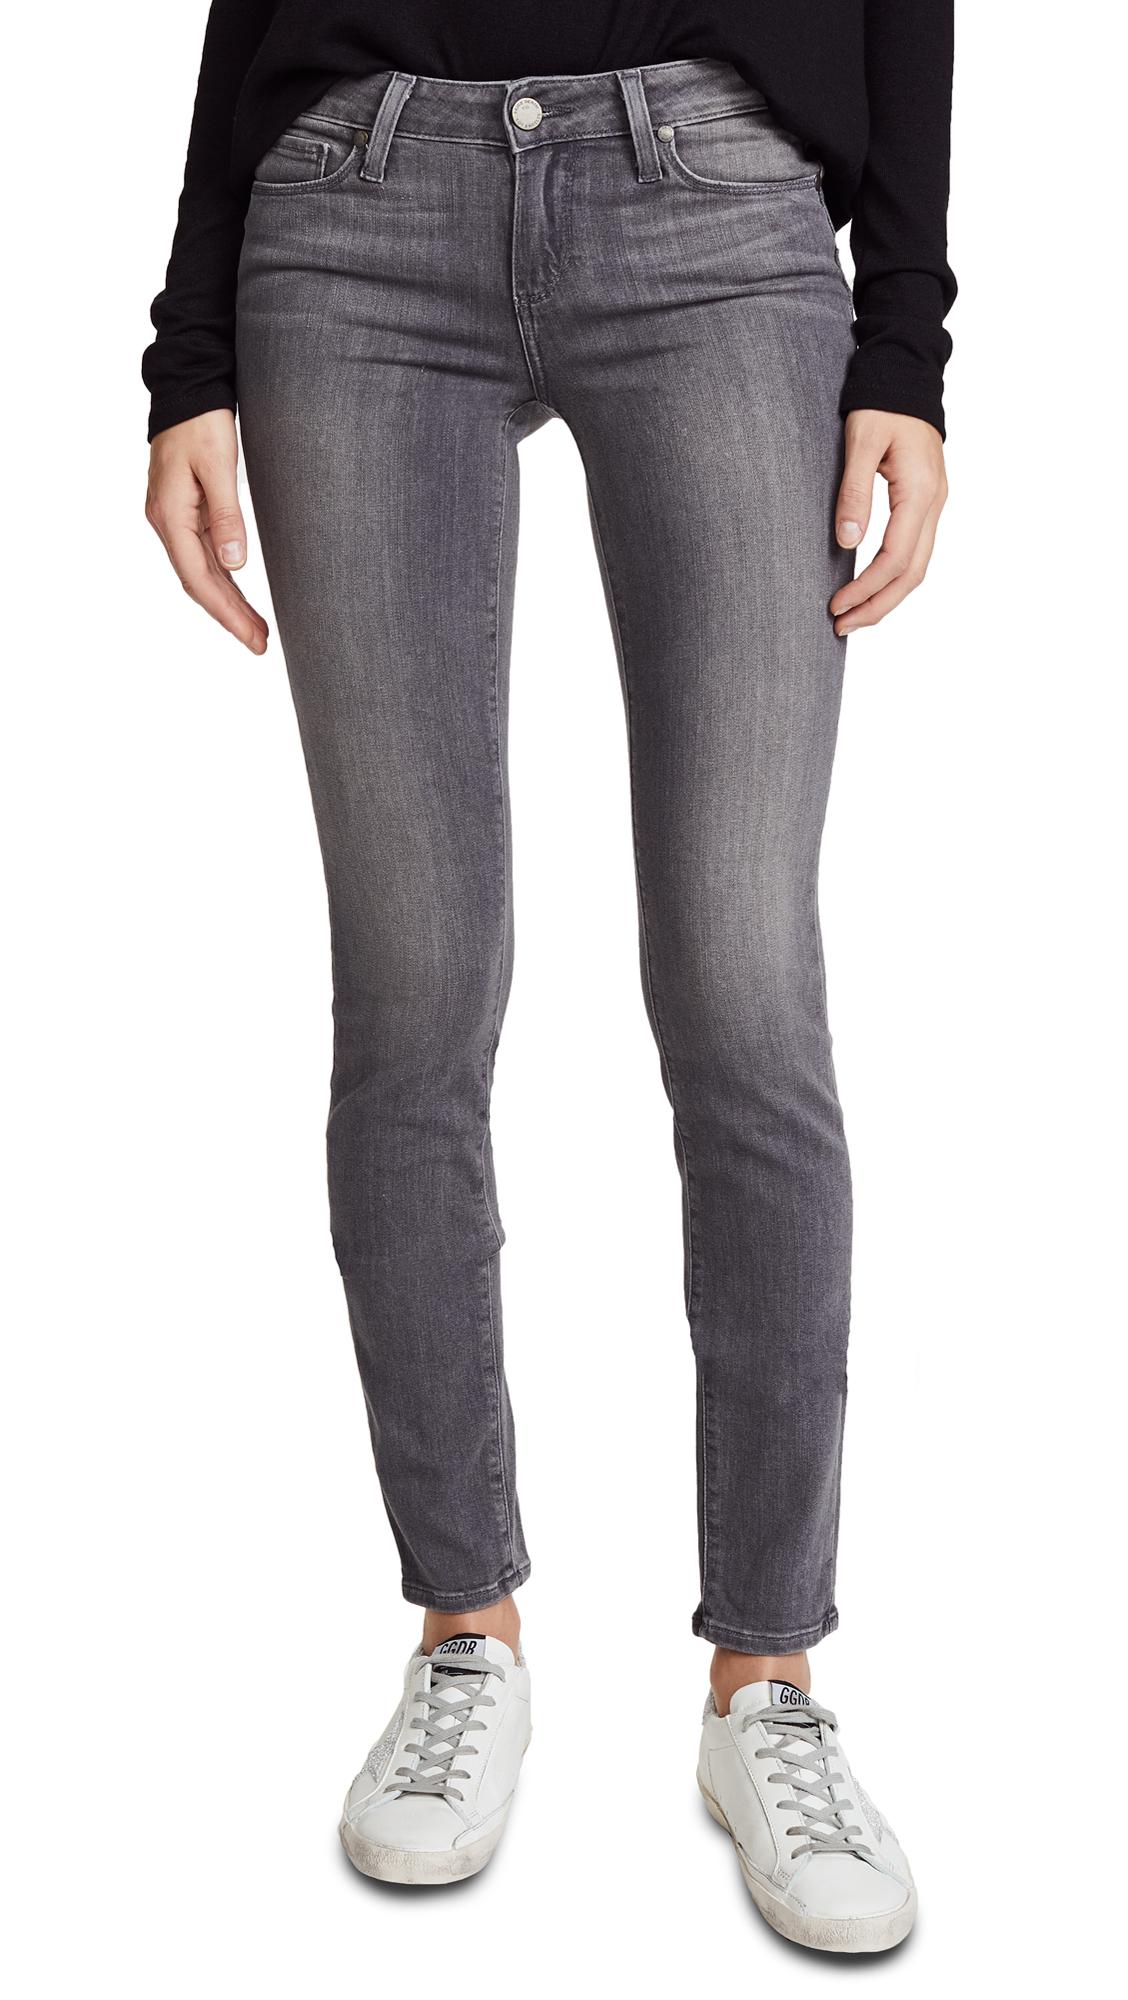 PAIGE Transcend Verdugo Skinny Jeans In Silvie